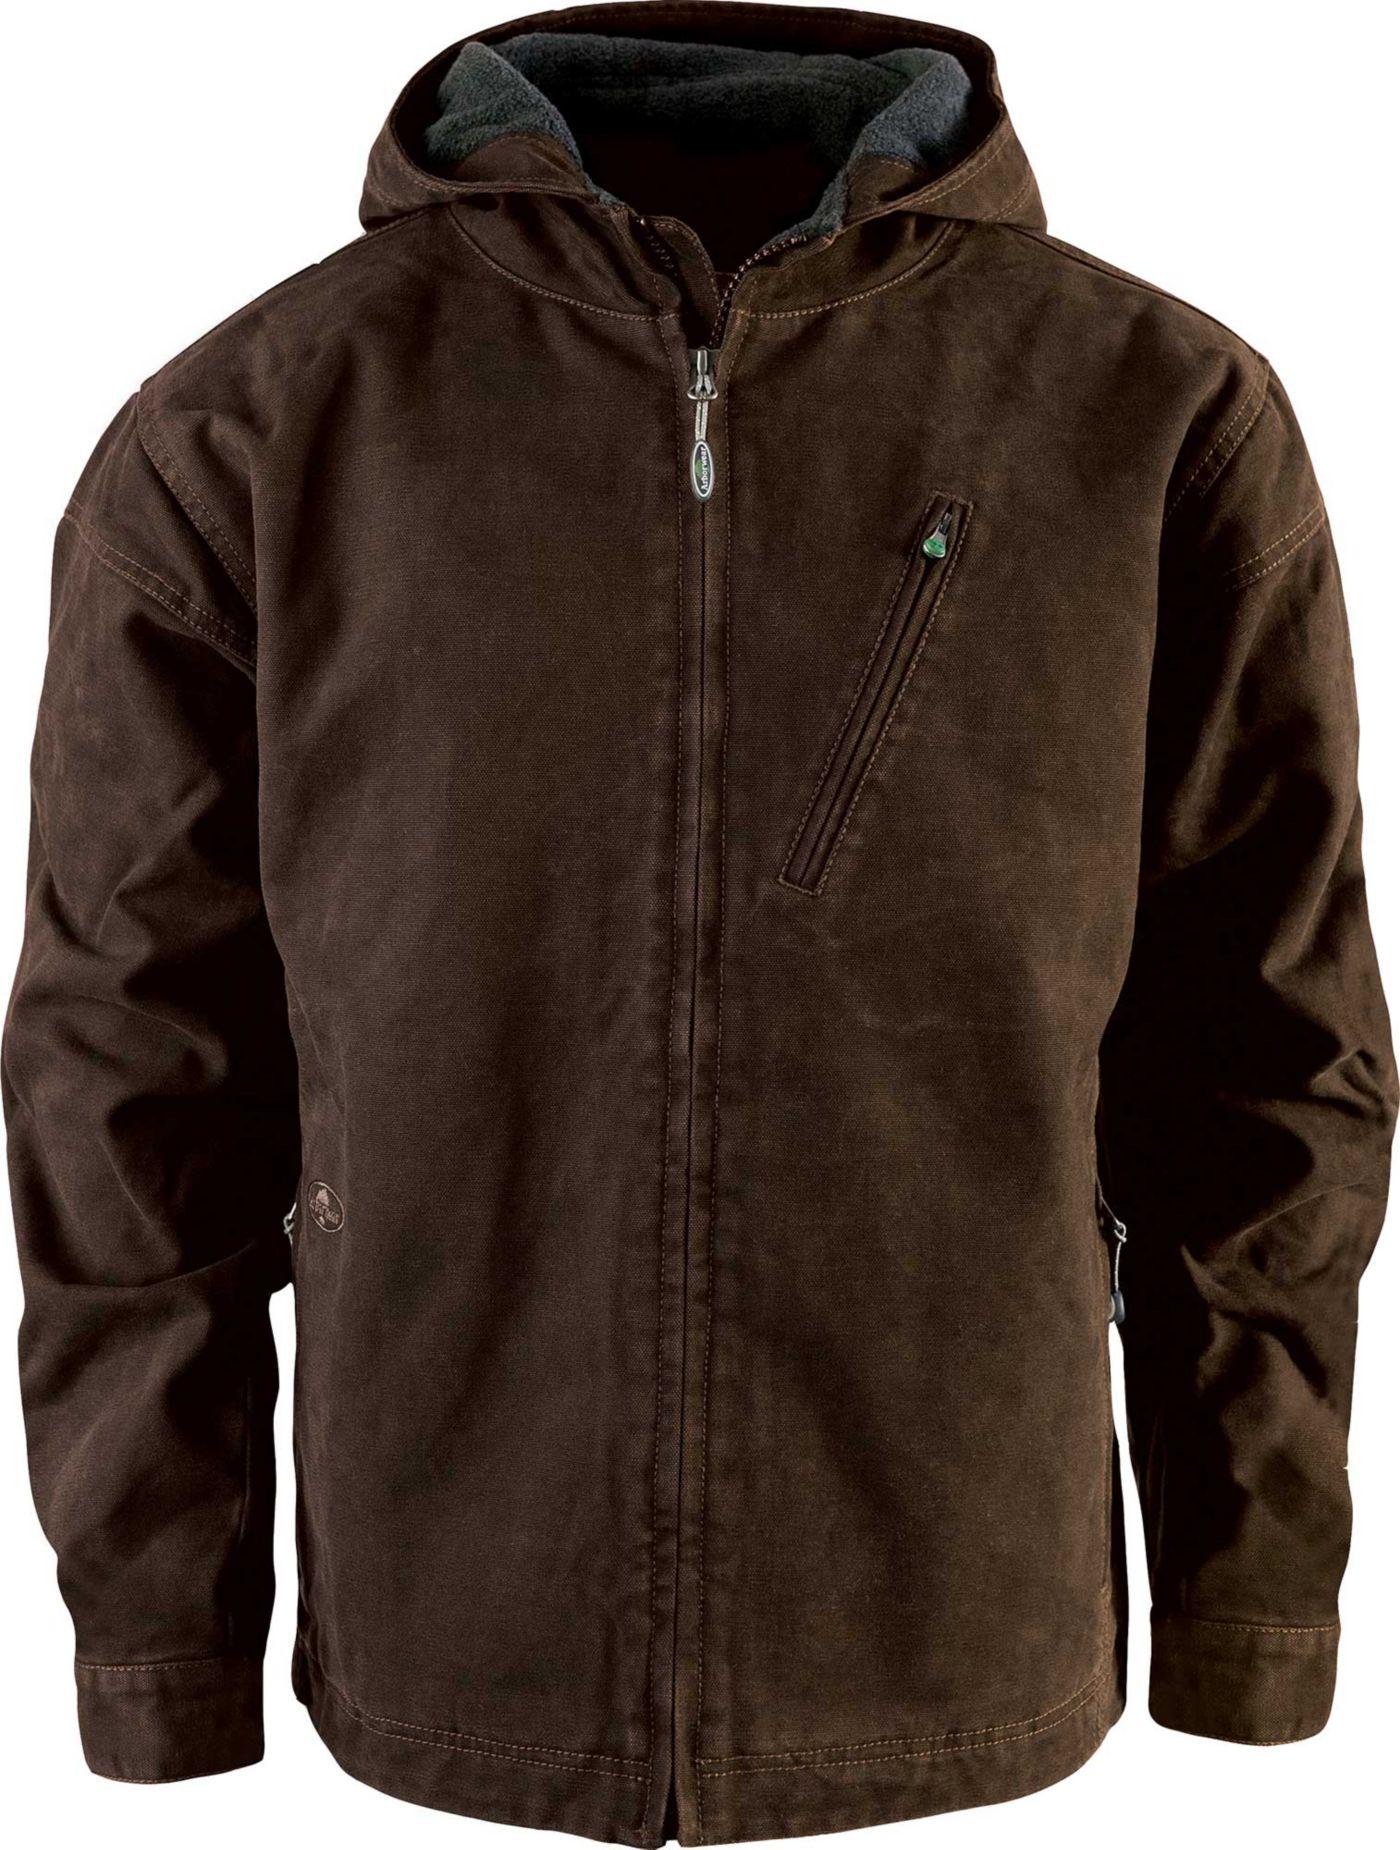 Arborwear Men's Hooded Bodark Jacket